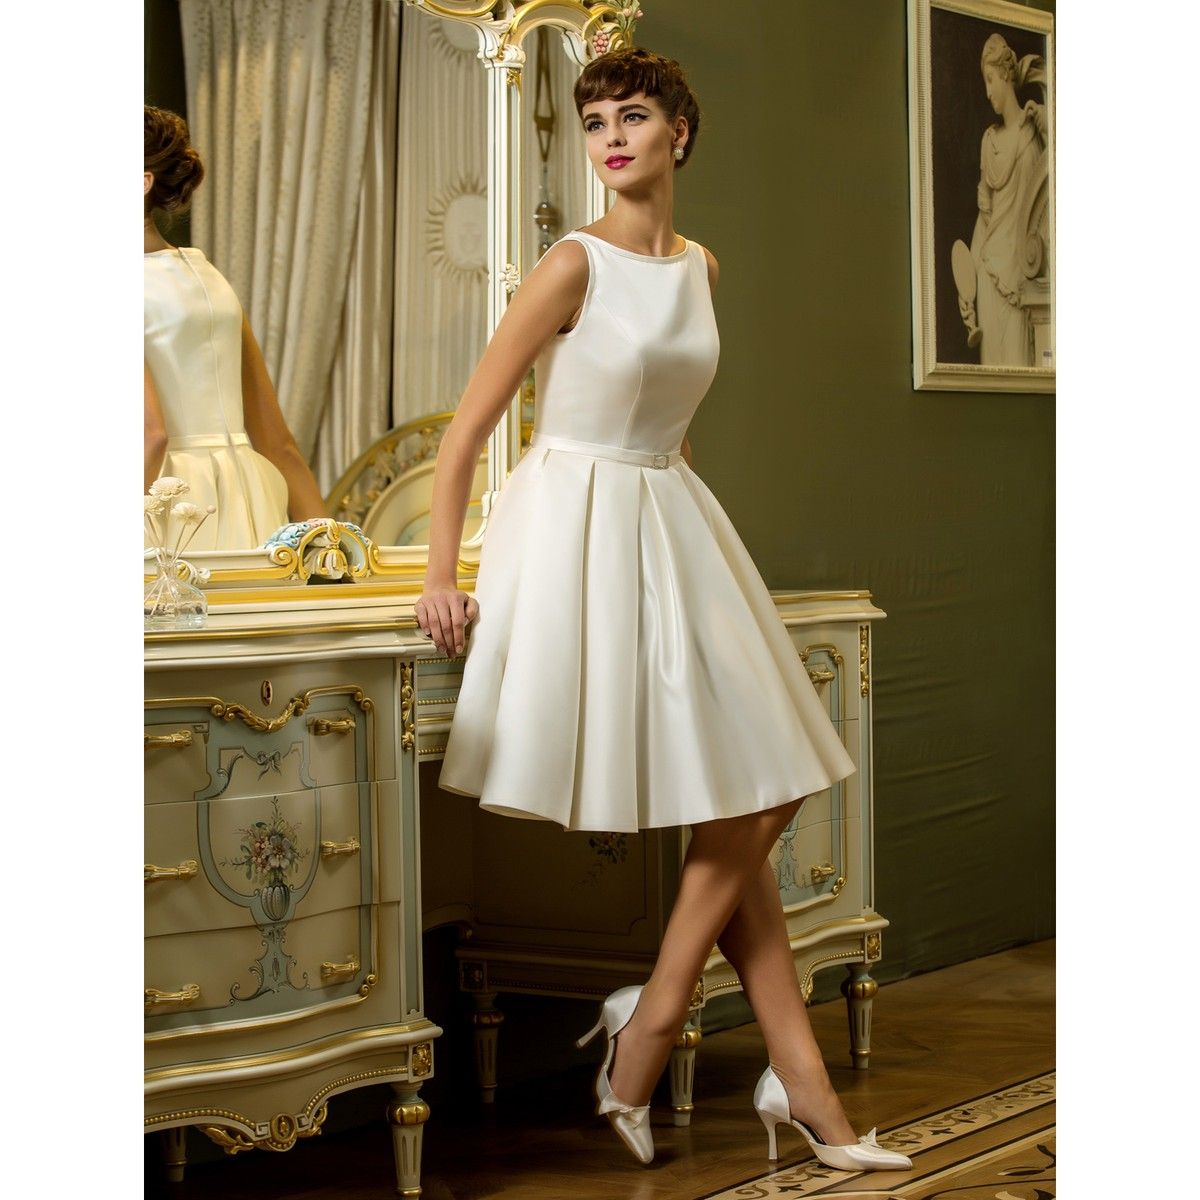 Knee length vintage wedding dresses  Aline Bateau Kneelength Satin Wedding Dress With Draping  Retro